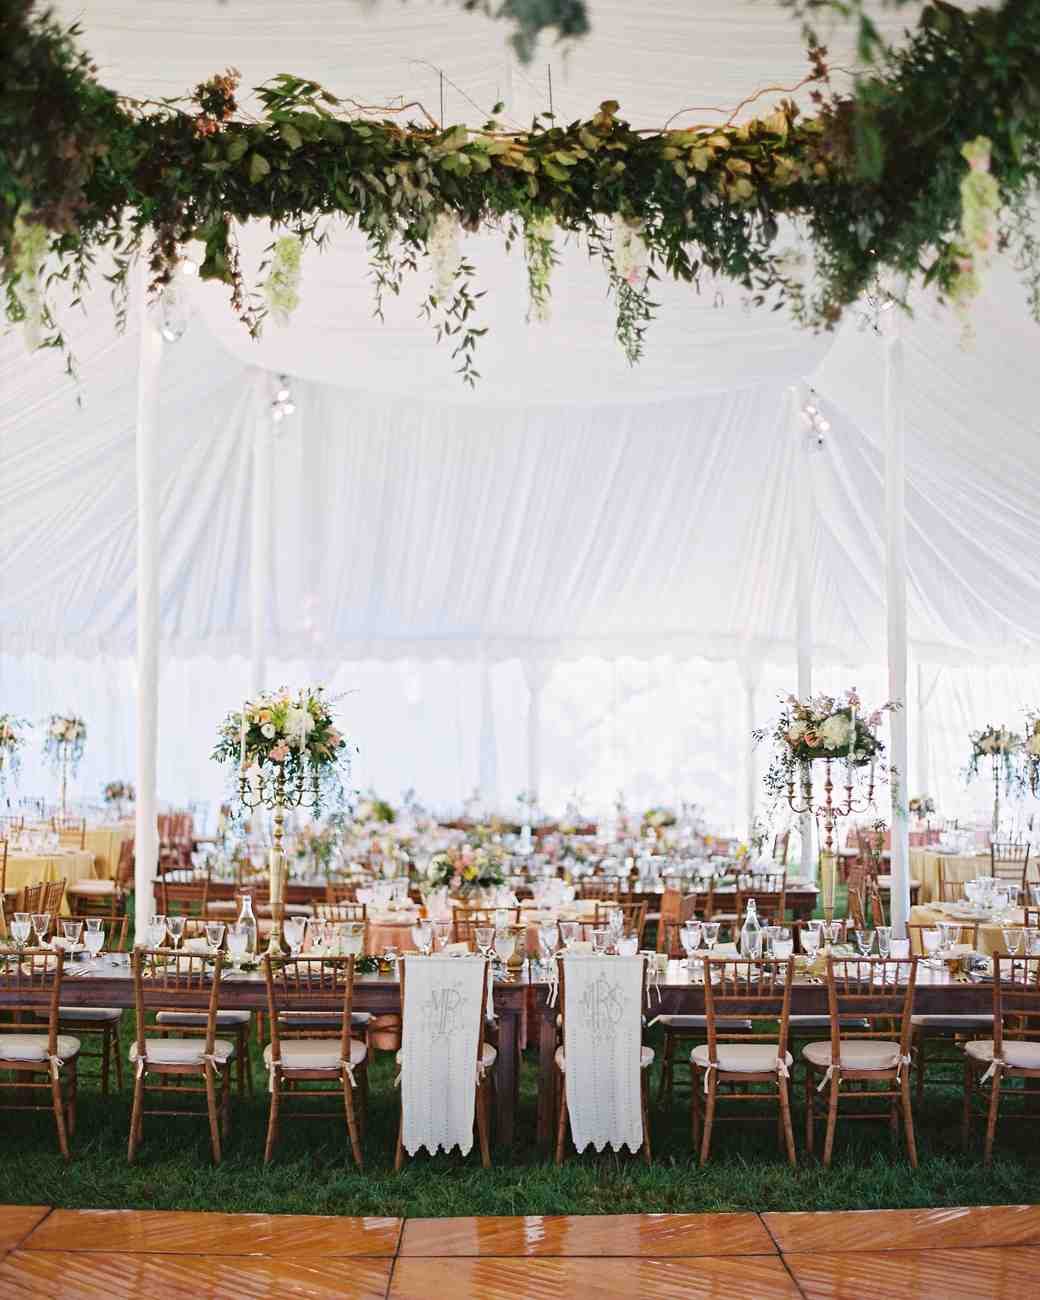 amy-garrison-wedding-tent-00743-6134266-0816.jpg